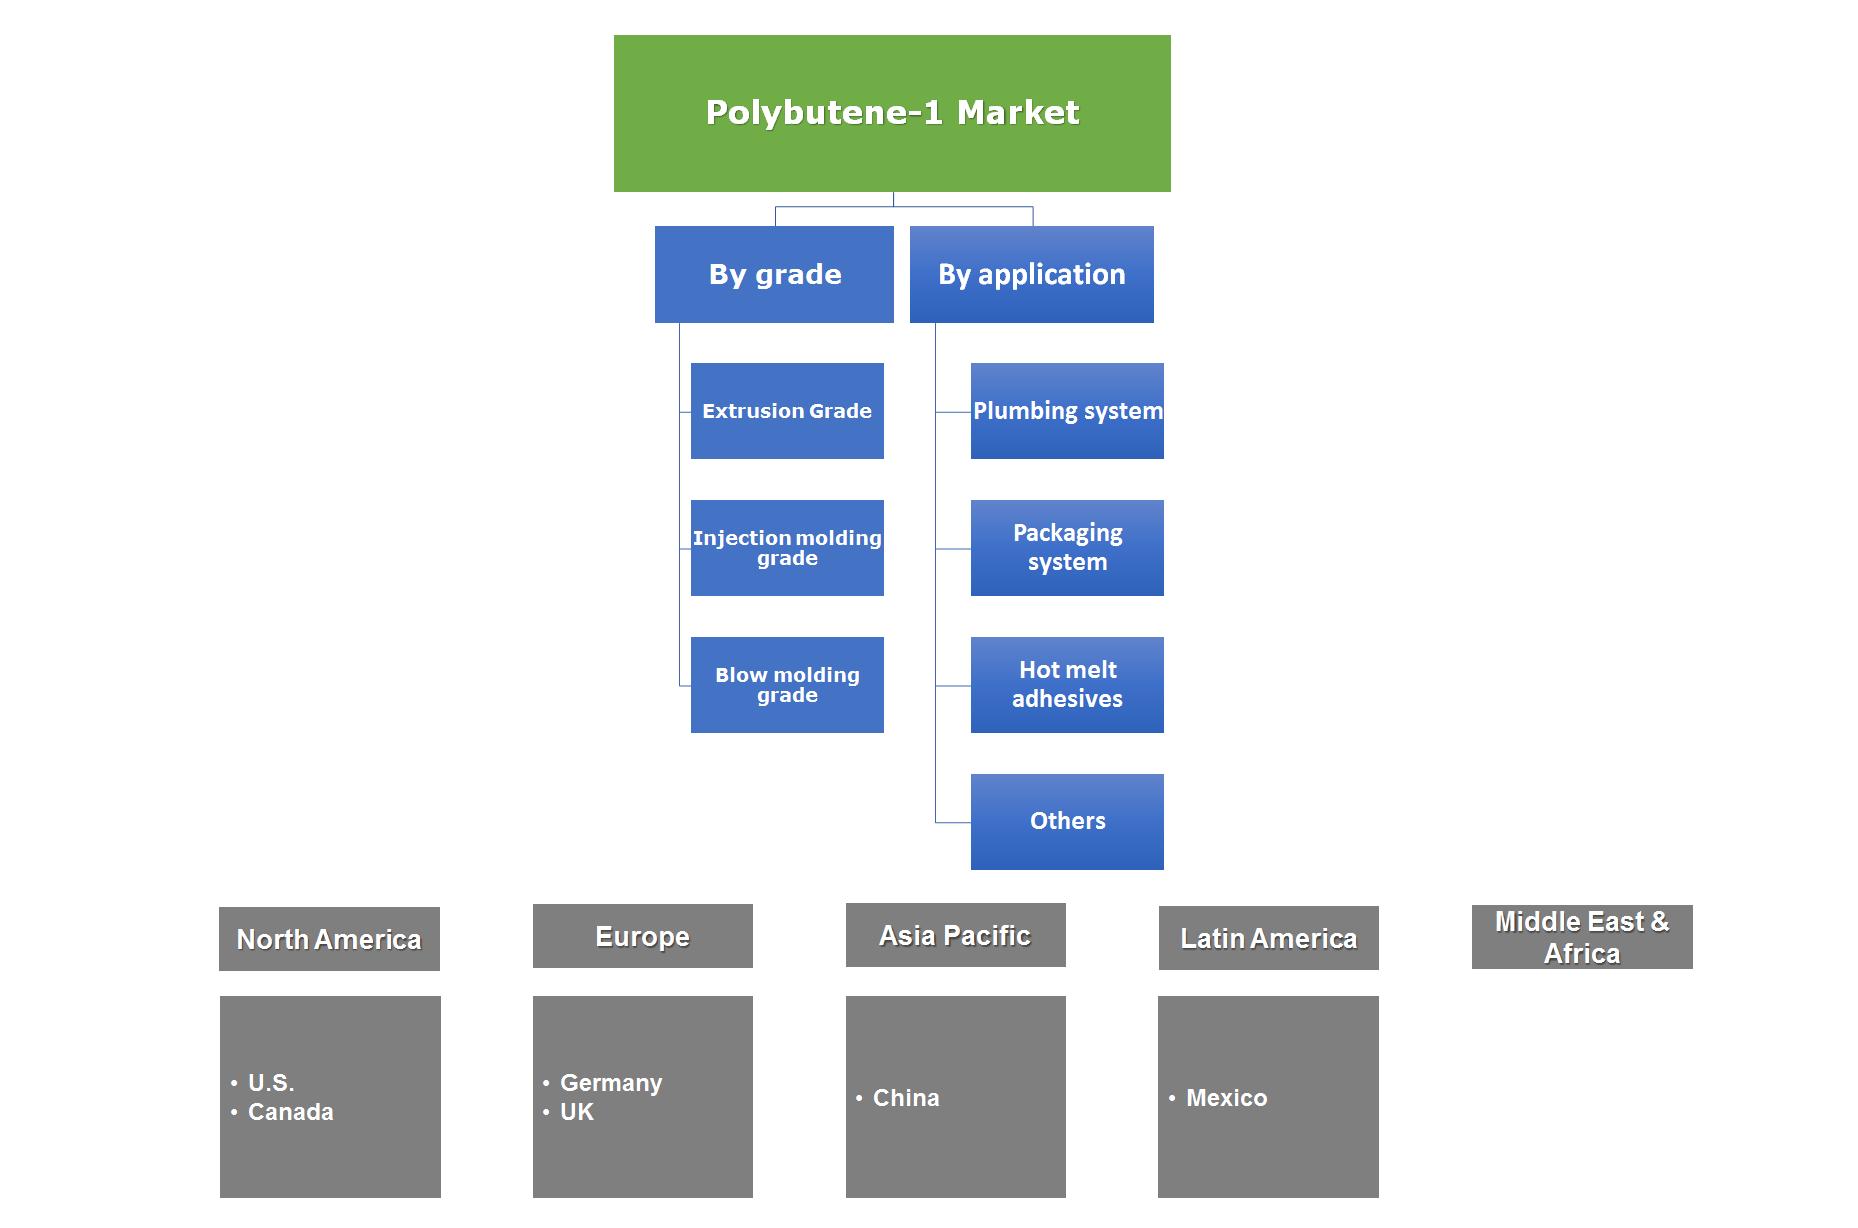 Polybutene-1 Market